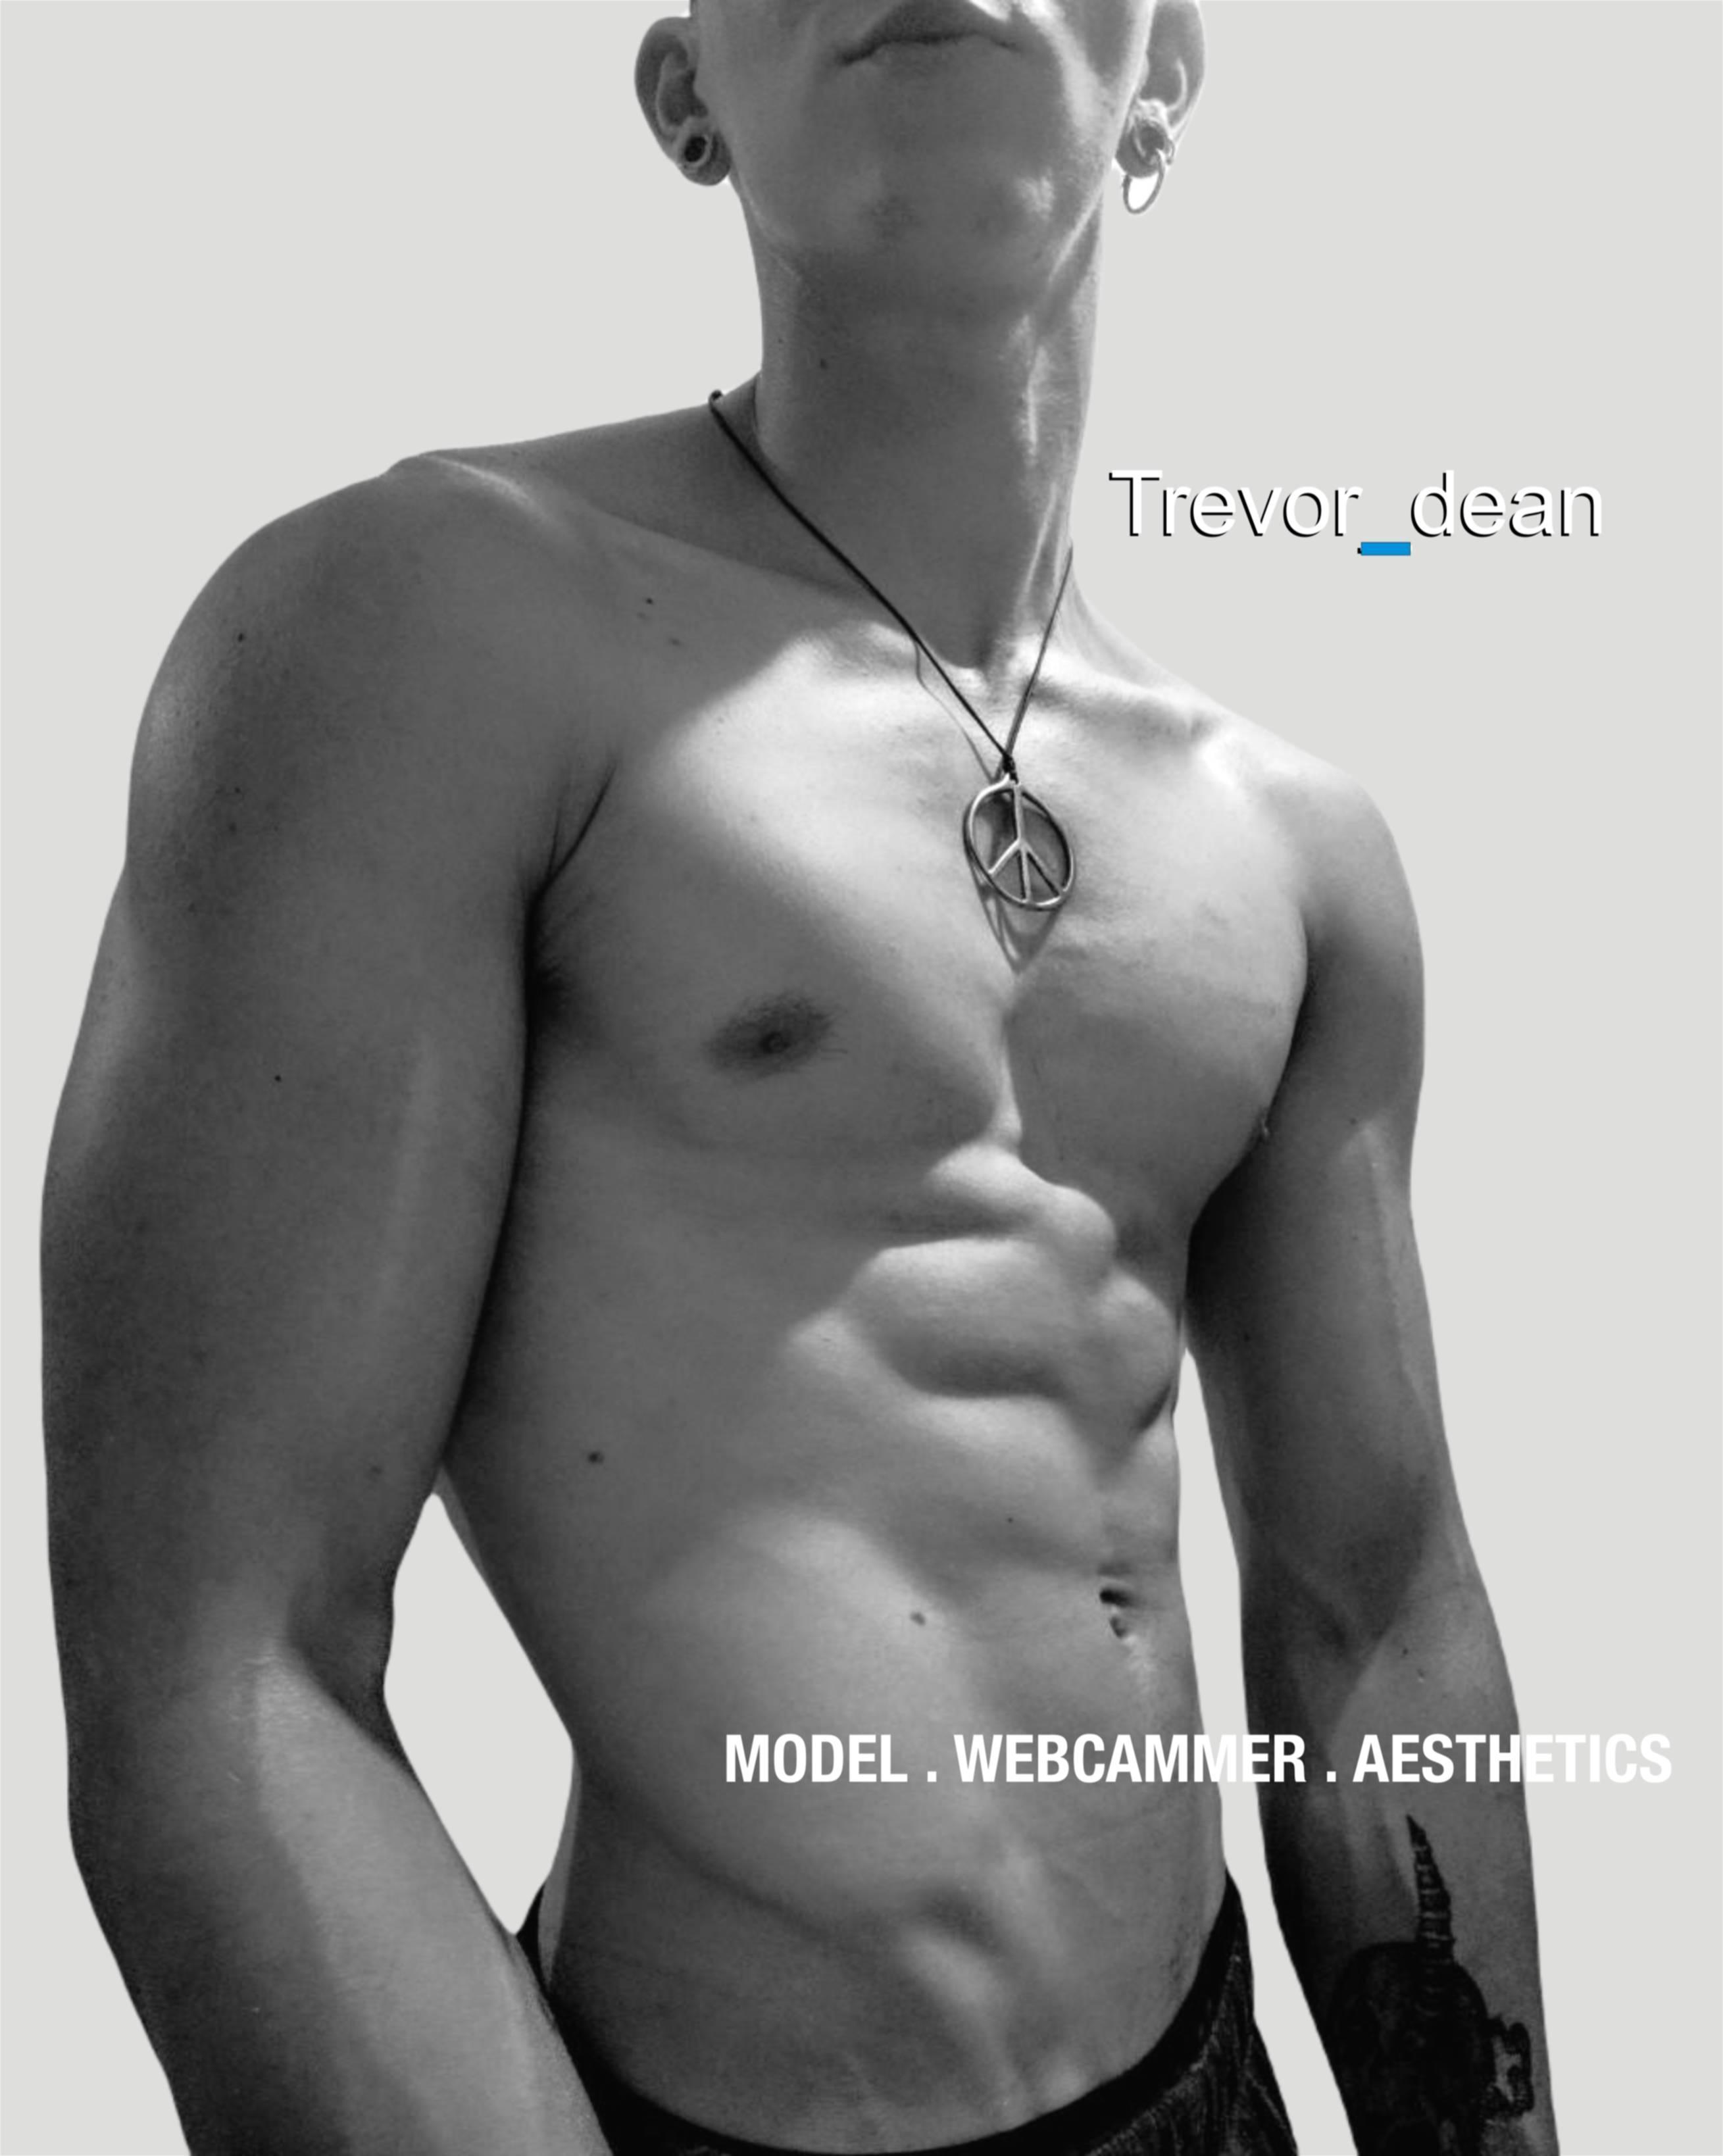 Trevor dean?s=cpntwcawush65lqjcu2igo+orz+xgwdhp7egi+jl9im=